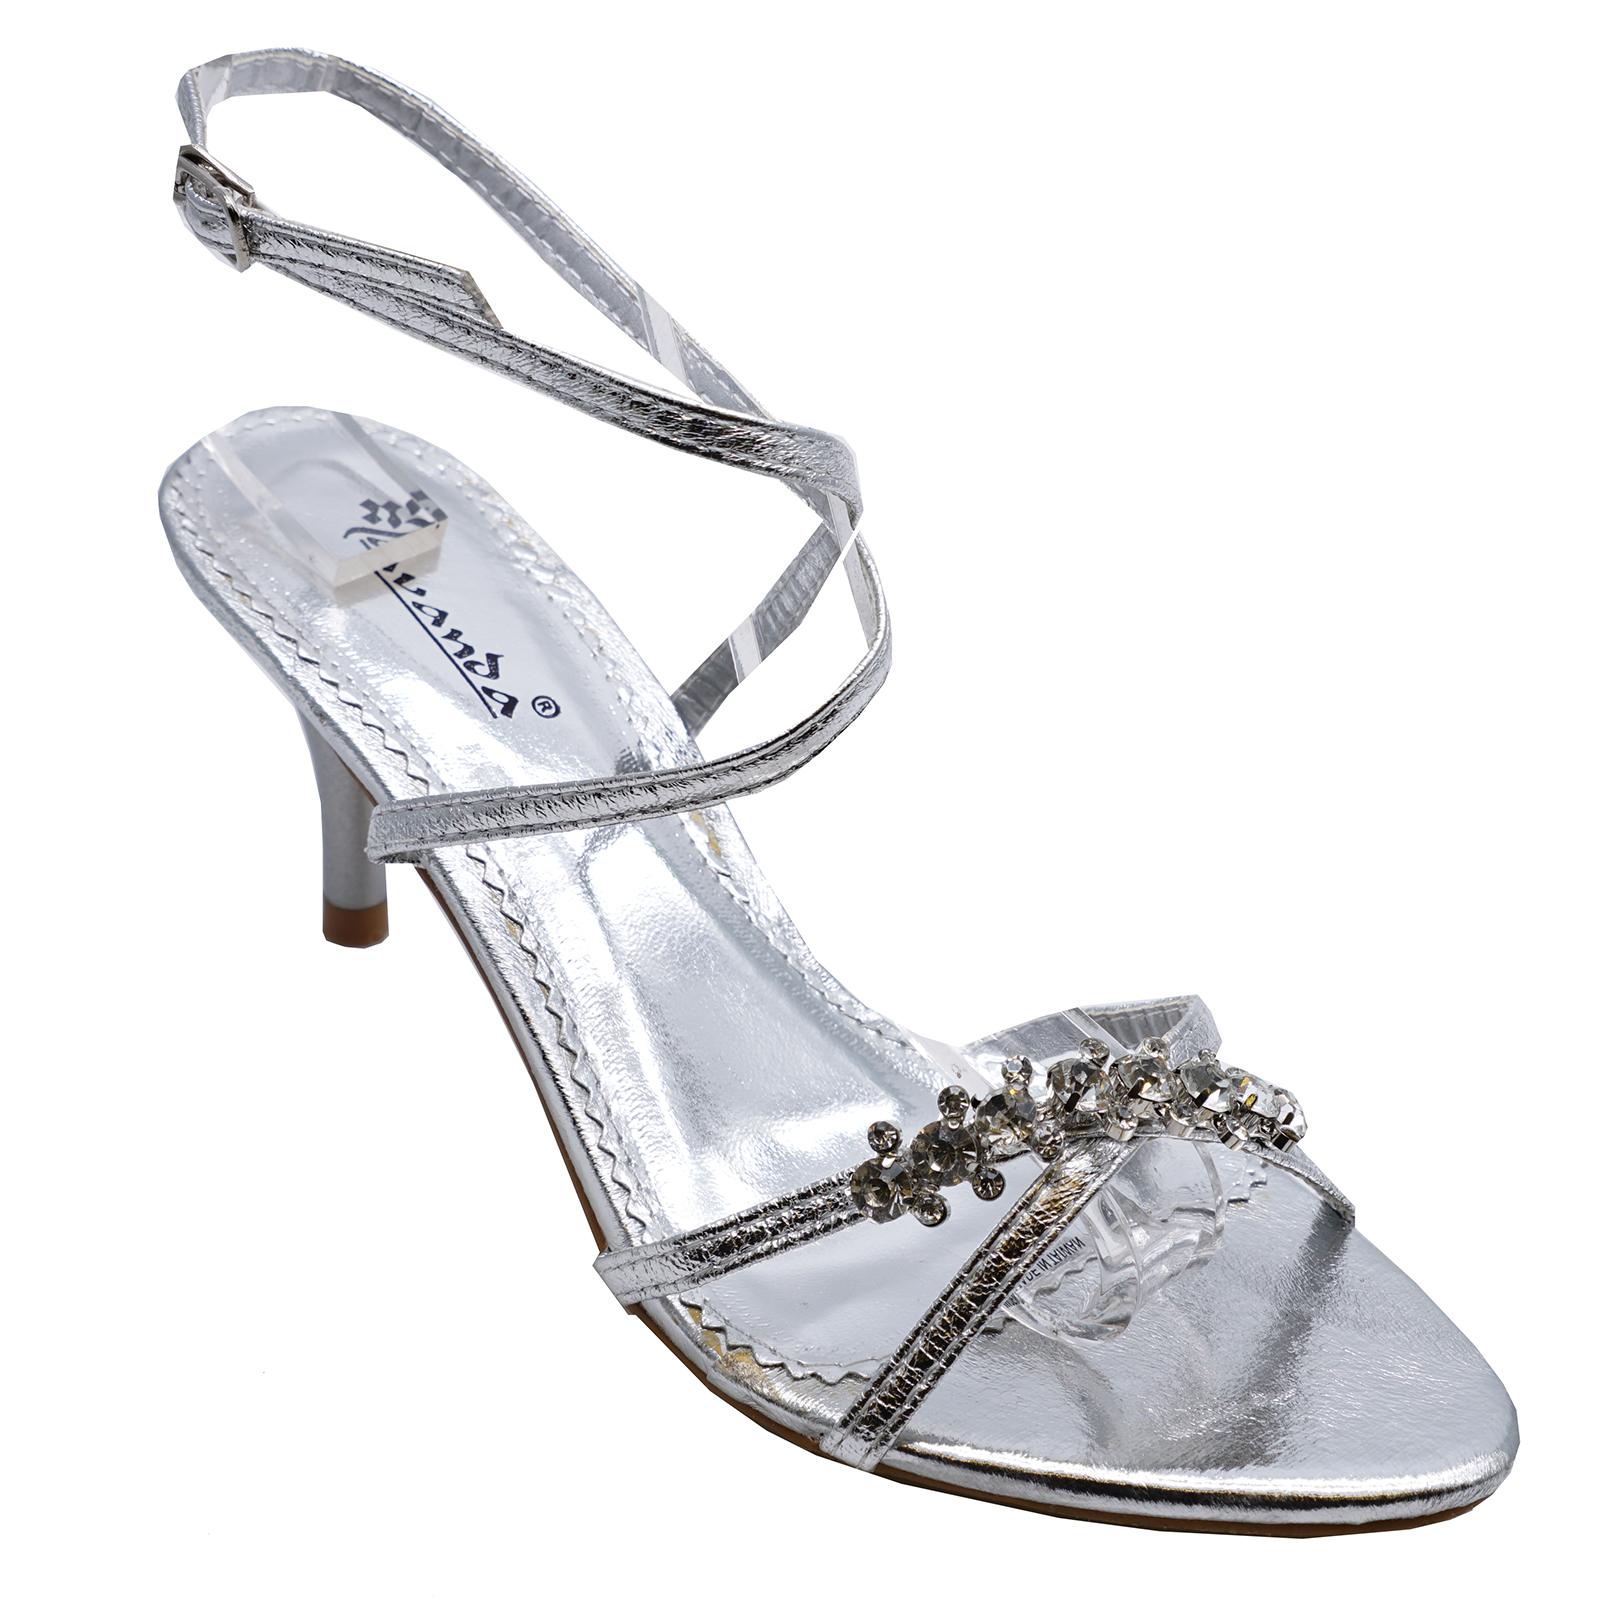 70e5da3141d Ladies Silver Kitten Heel Strappy Evening Diamante Elegant Sandals Shoes UK  3-8. About this product. Picture 1 of 4  Picture 2 of 4  Picture 3 of 4   Picture ...